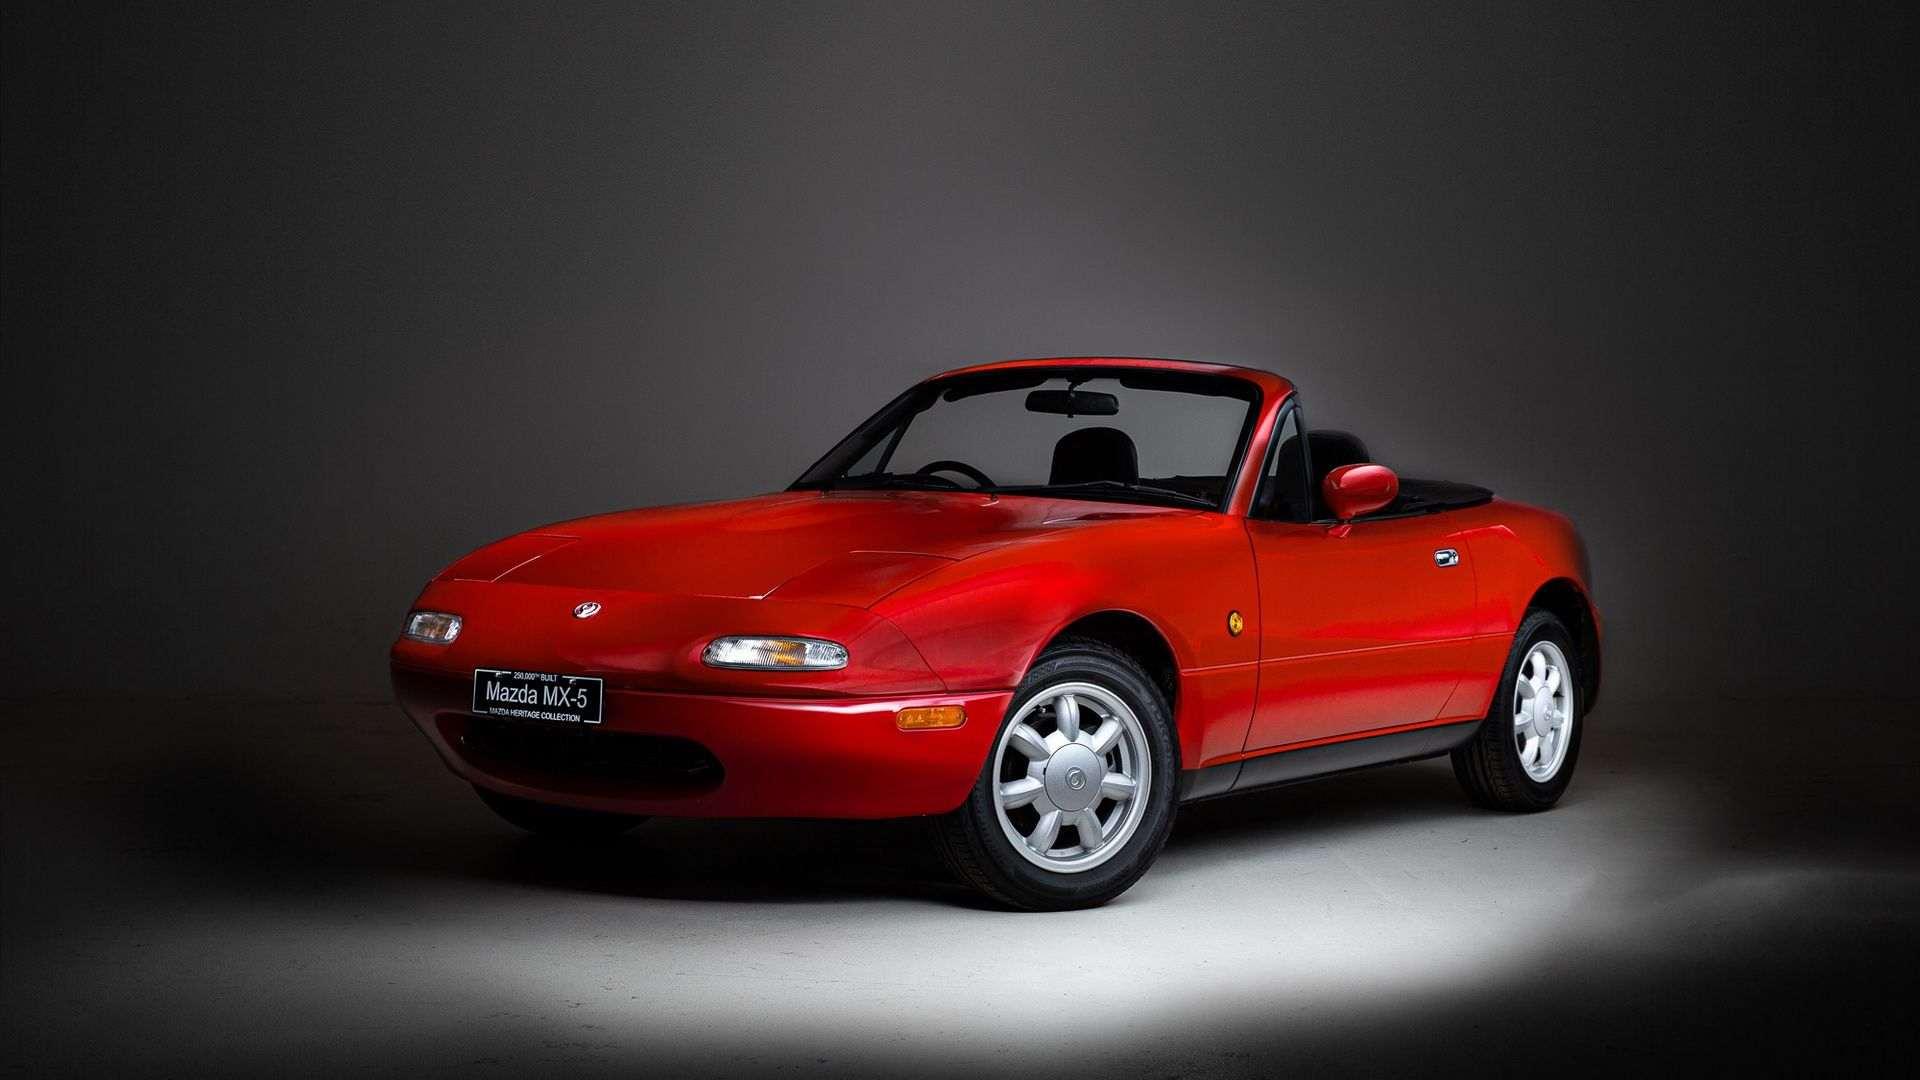 Mazda_MX-5_restoration_parts_0008